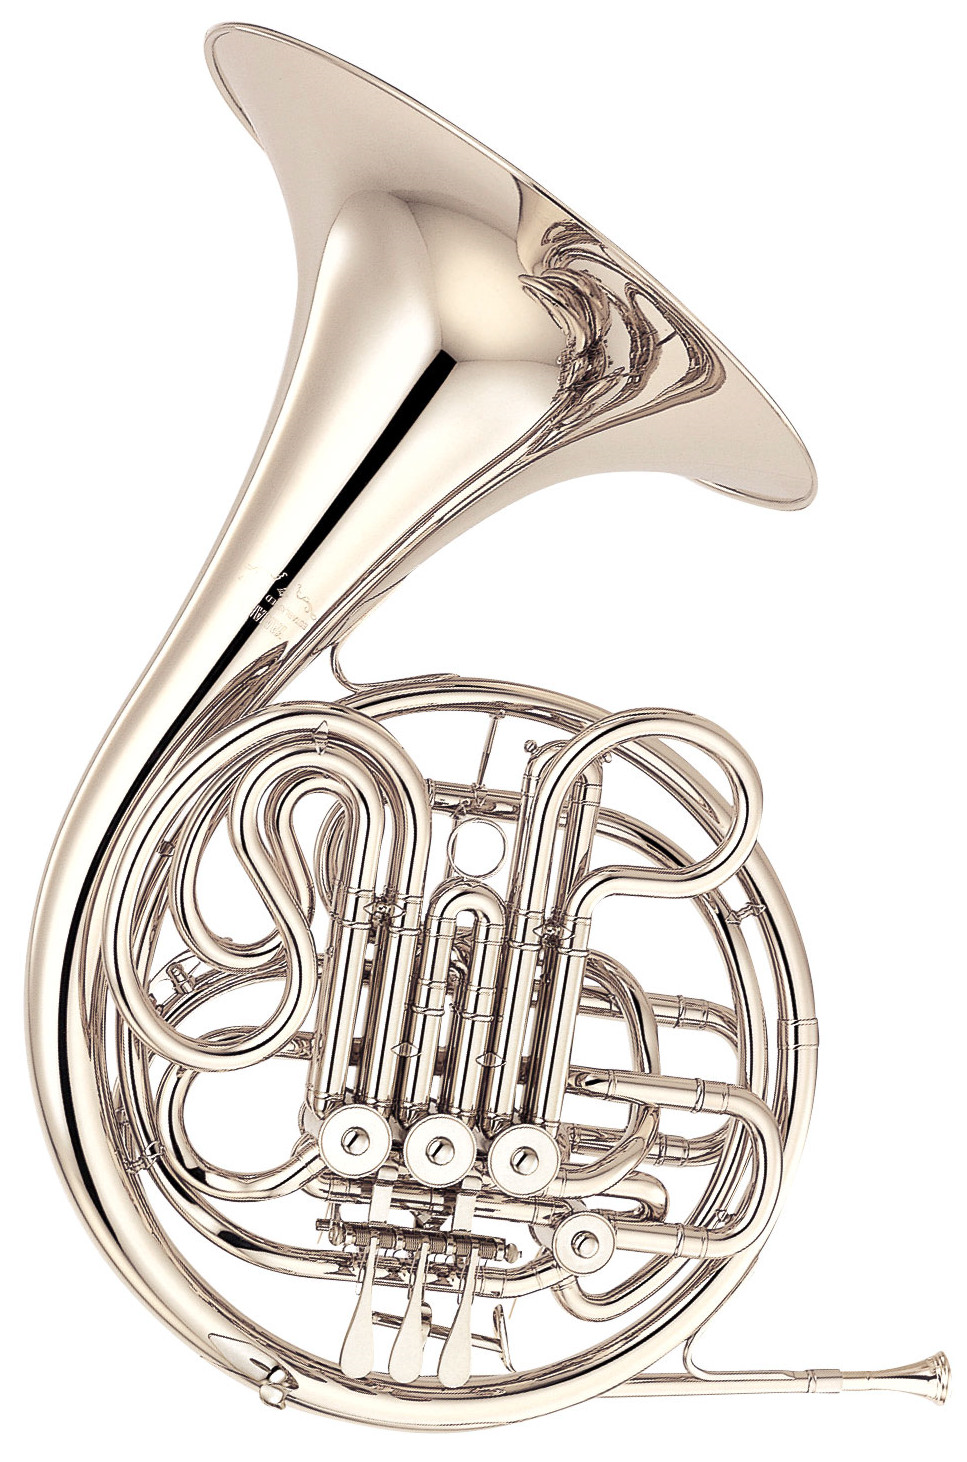 wurzbach single bb french horn Single horns engelbert schmid single b, y € 6370 a jungwirth lausmann historical valve b-flat -or f-horn ydc hans smit custom made french horns.